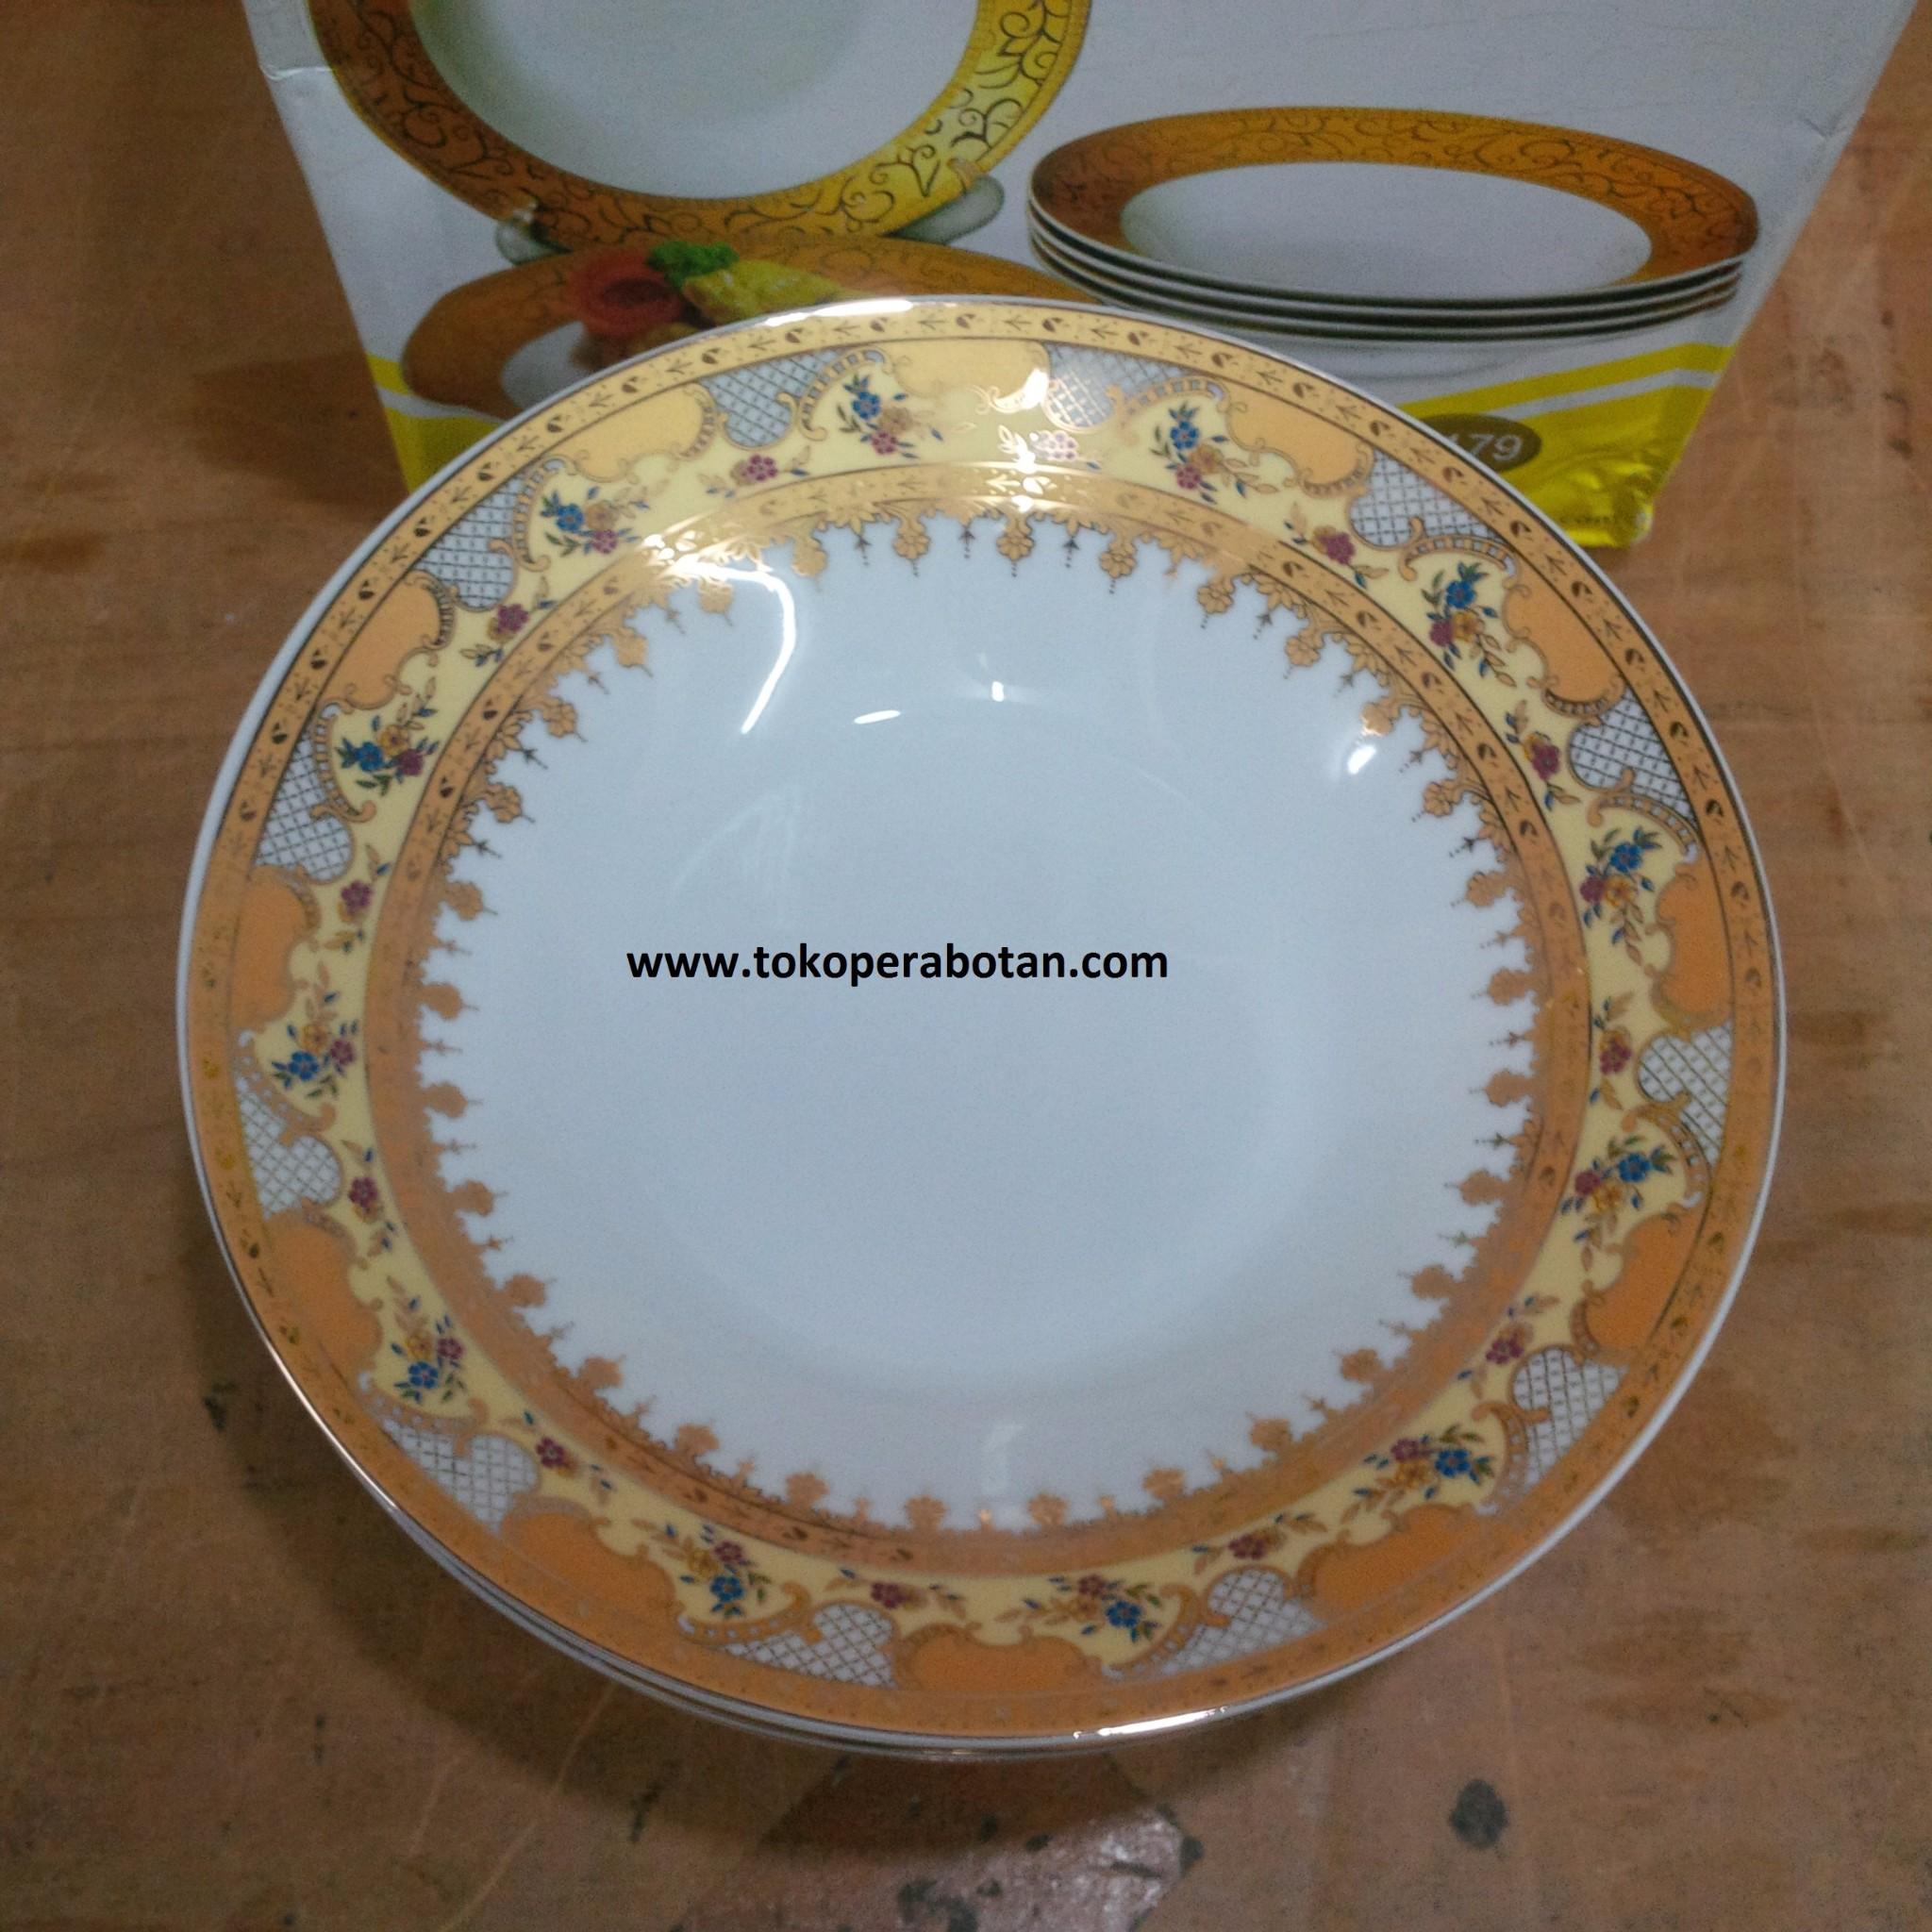 Info Penting 40+ Harga Piring Keramik Vicenza